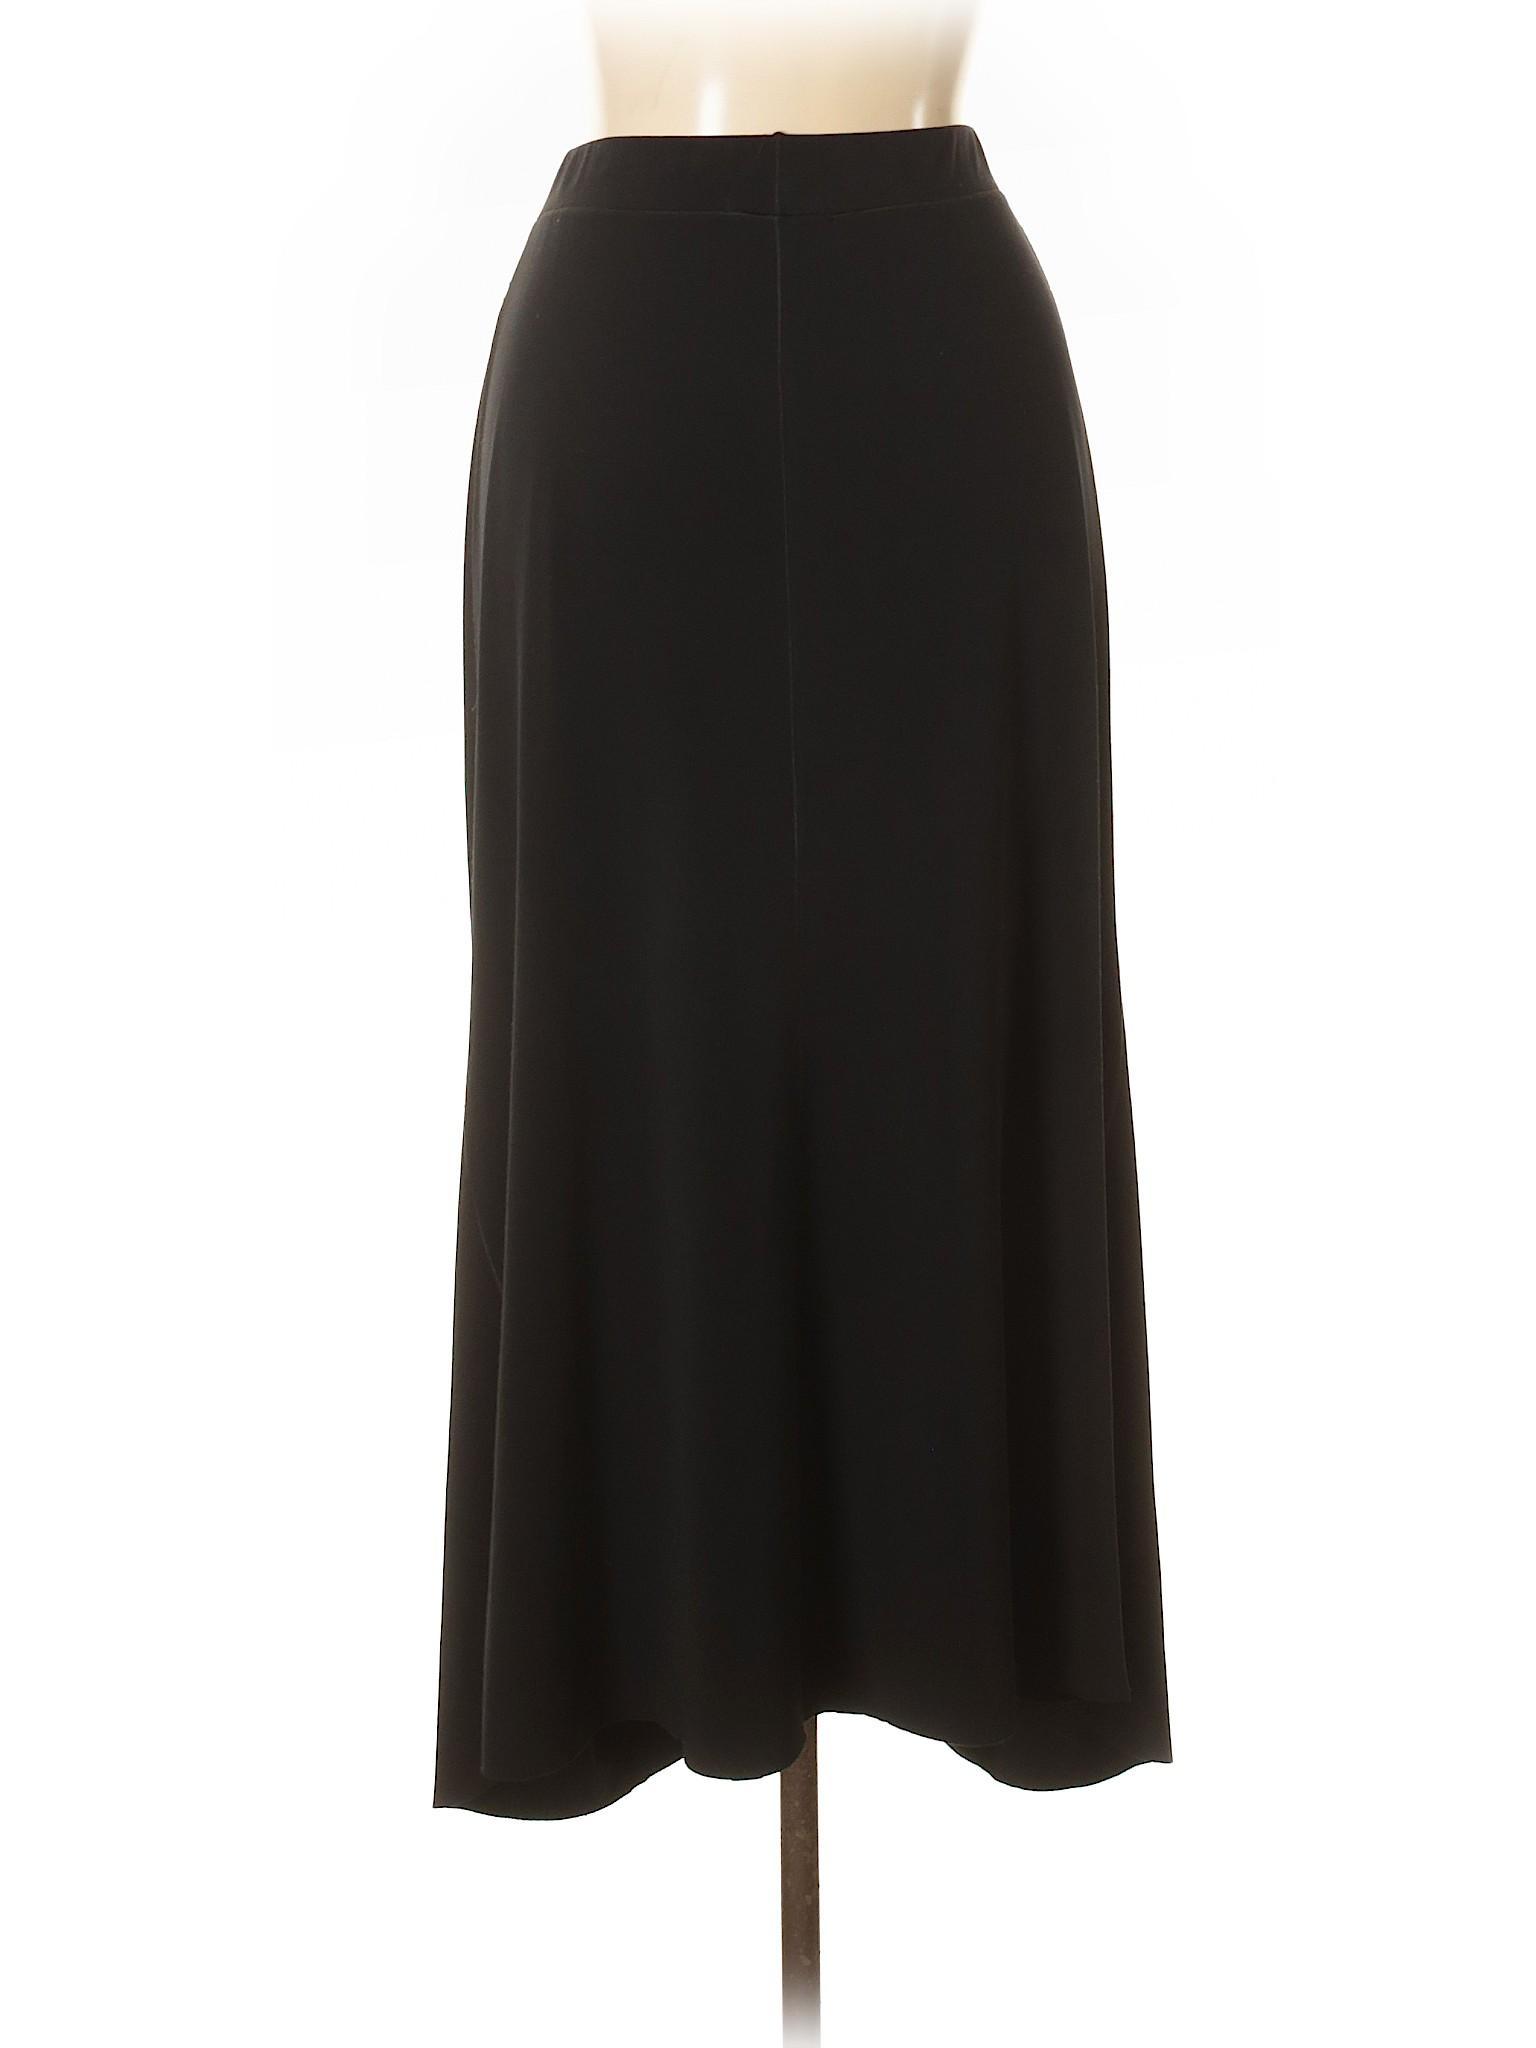 Skirt Boutique Casual Skirt Boutique Casual Boutique Boutique Skirt Casual xRBFqn8UgF